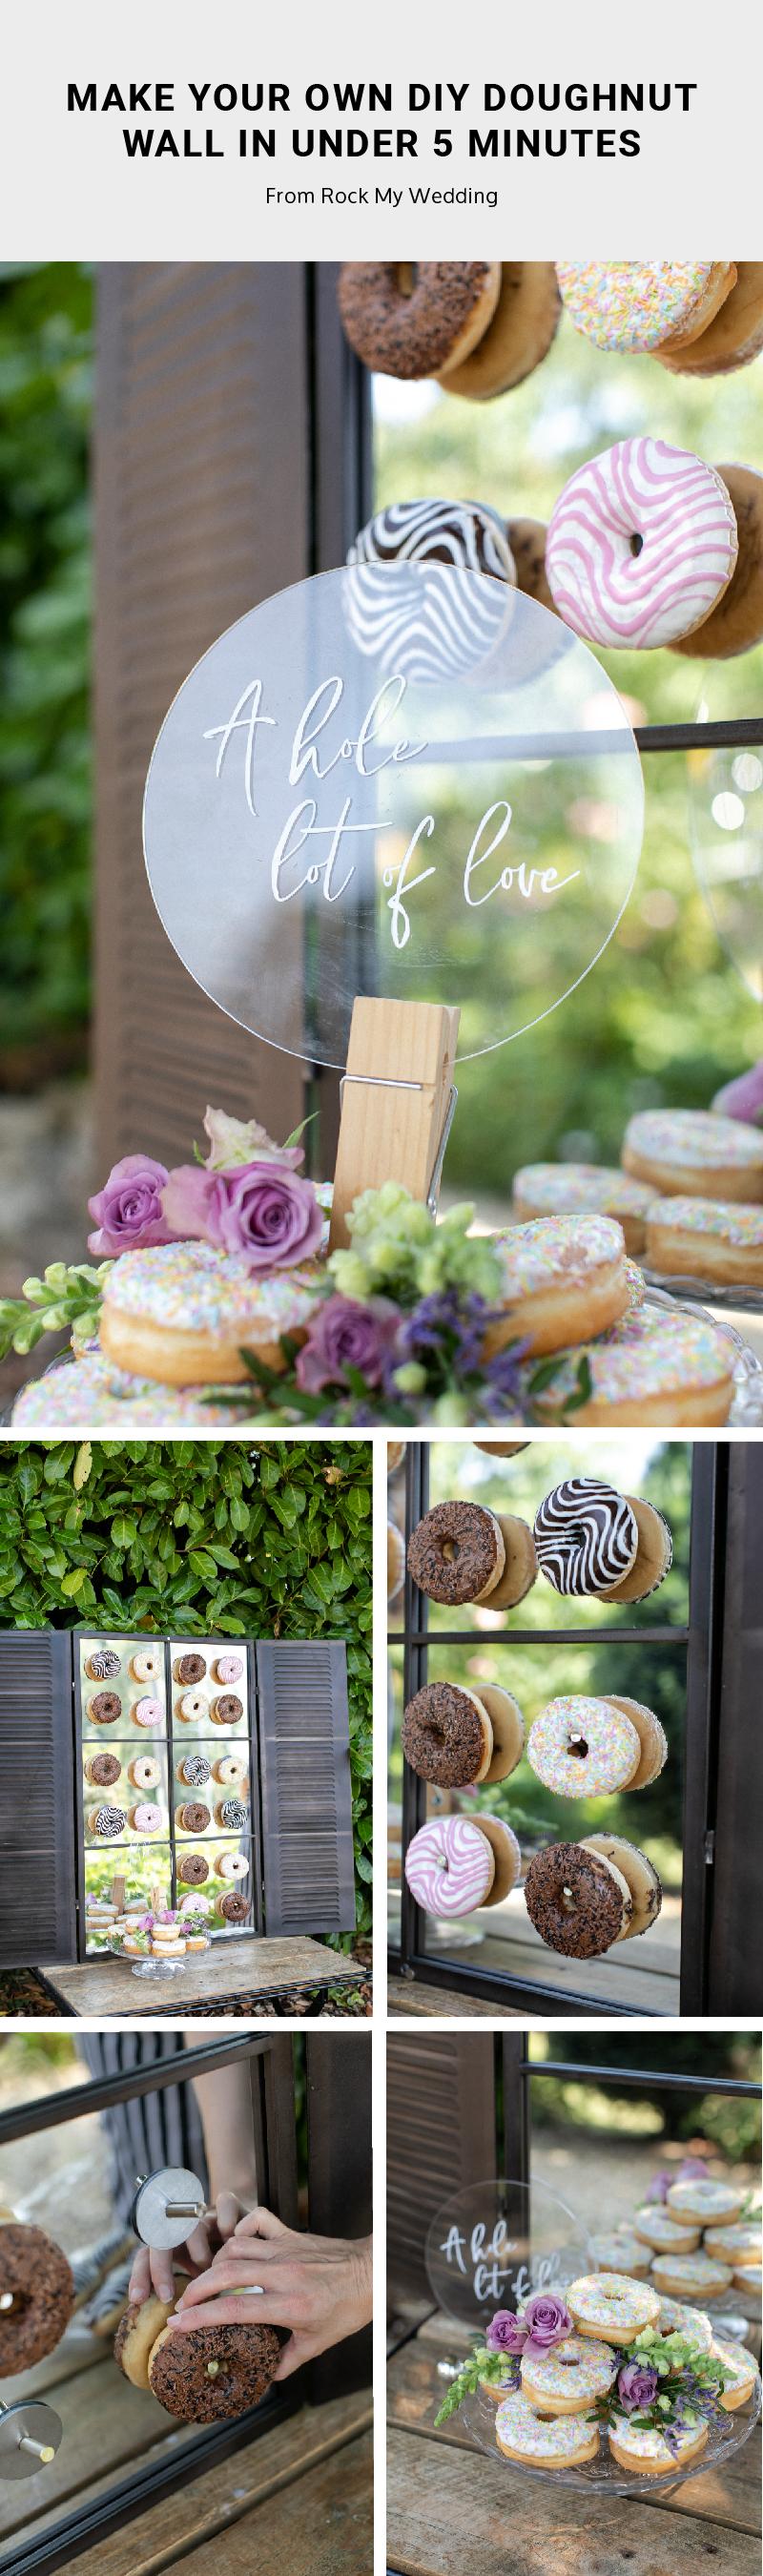 doughnut wall-01.jpg